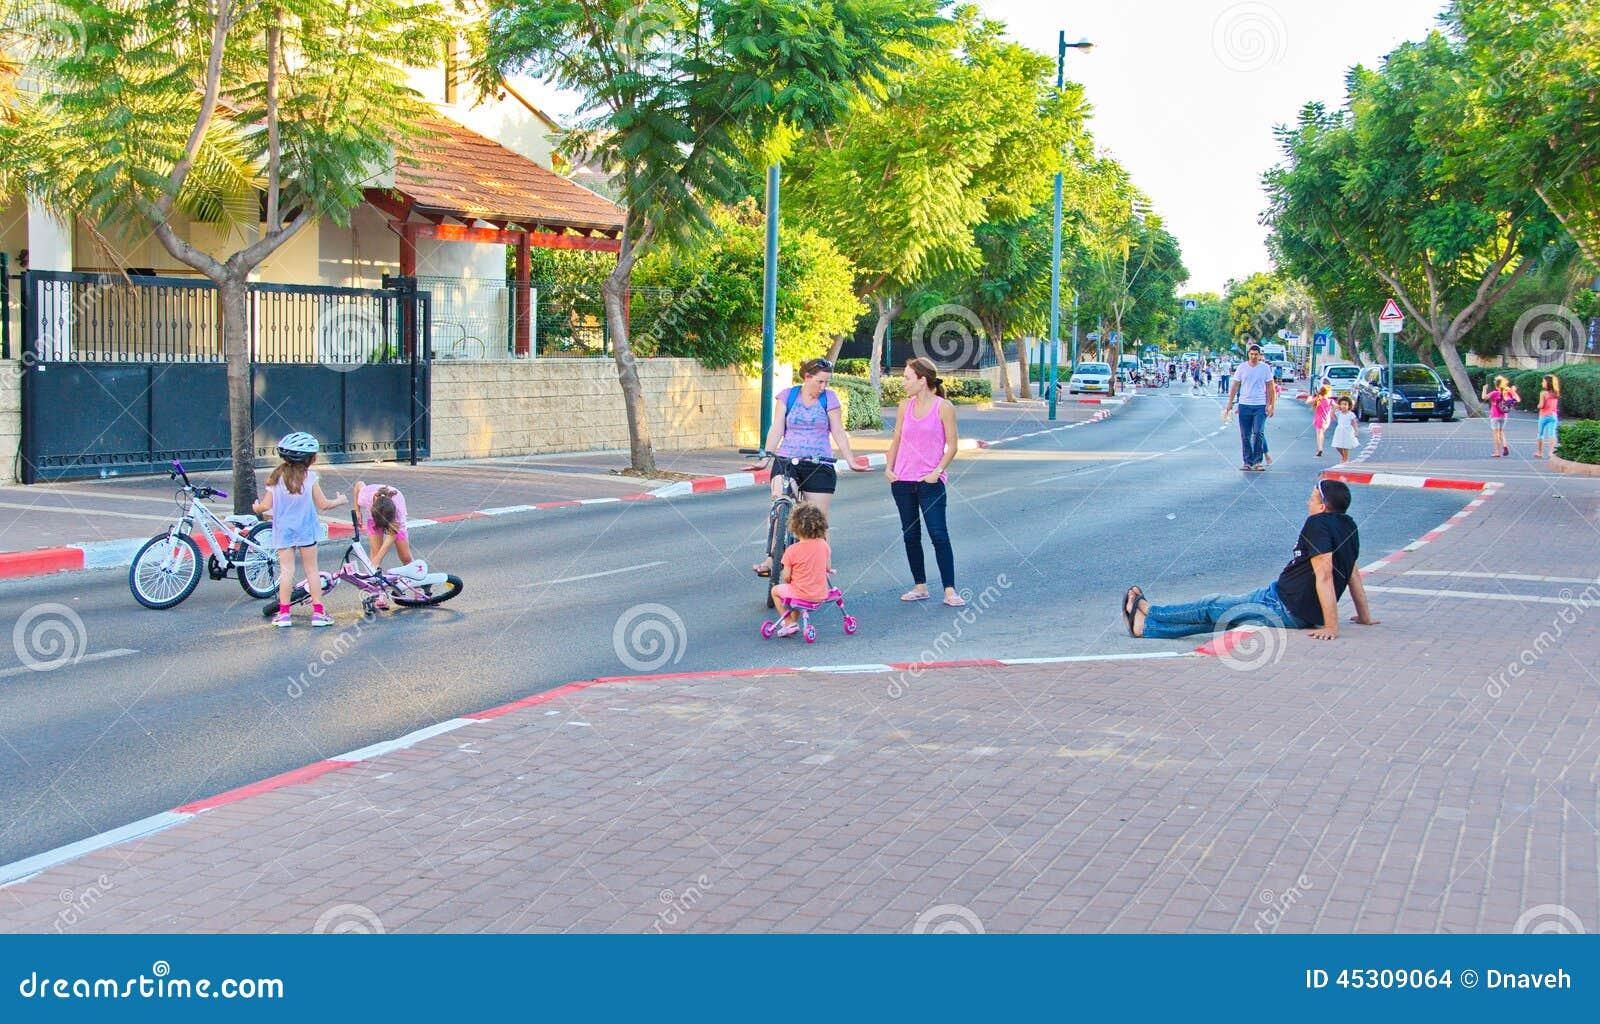 Yom Kippur In Tel Aviv, Israel Editorial Stock Image - Image